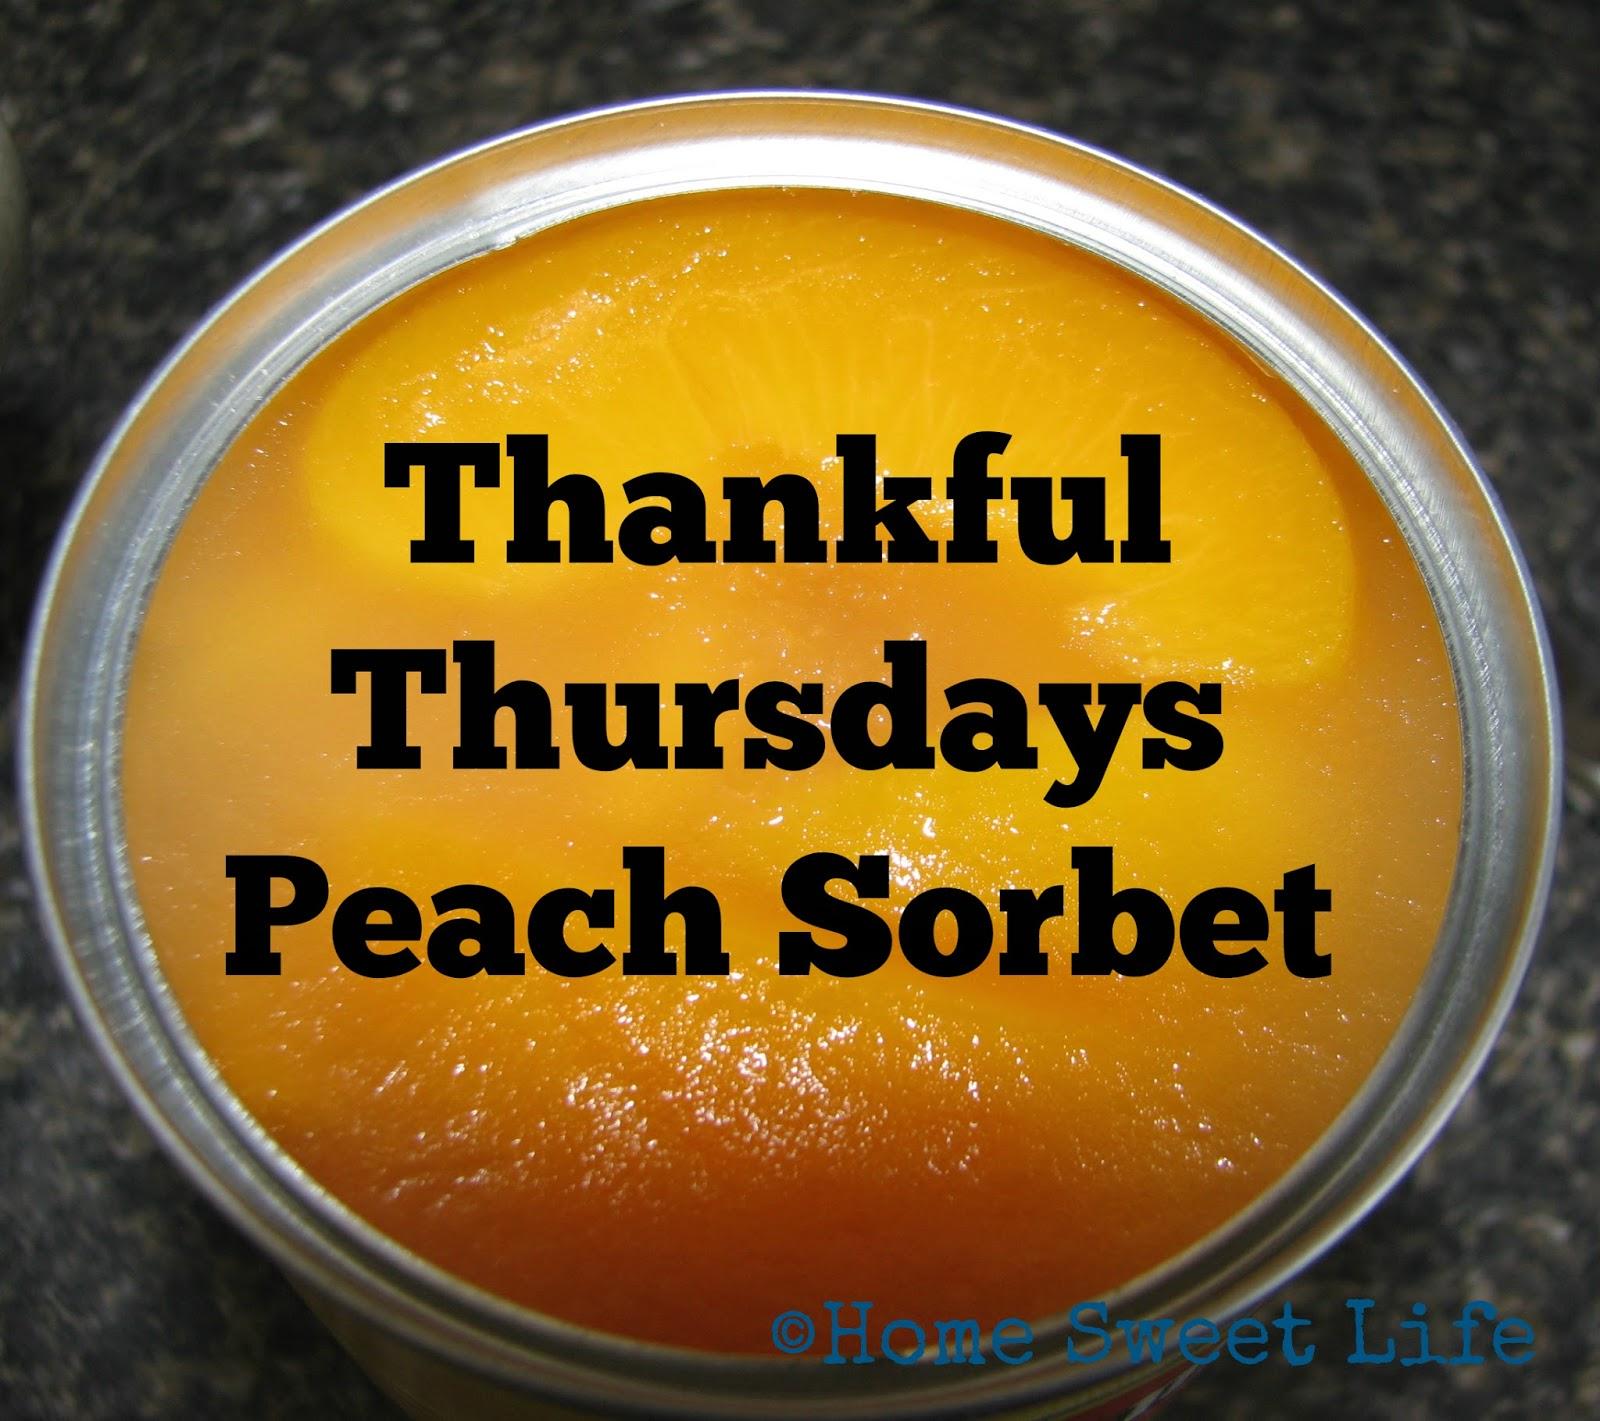 Thankful Thursdays - Peach Sorbet